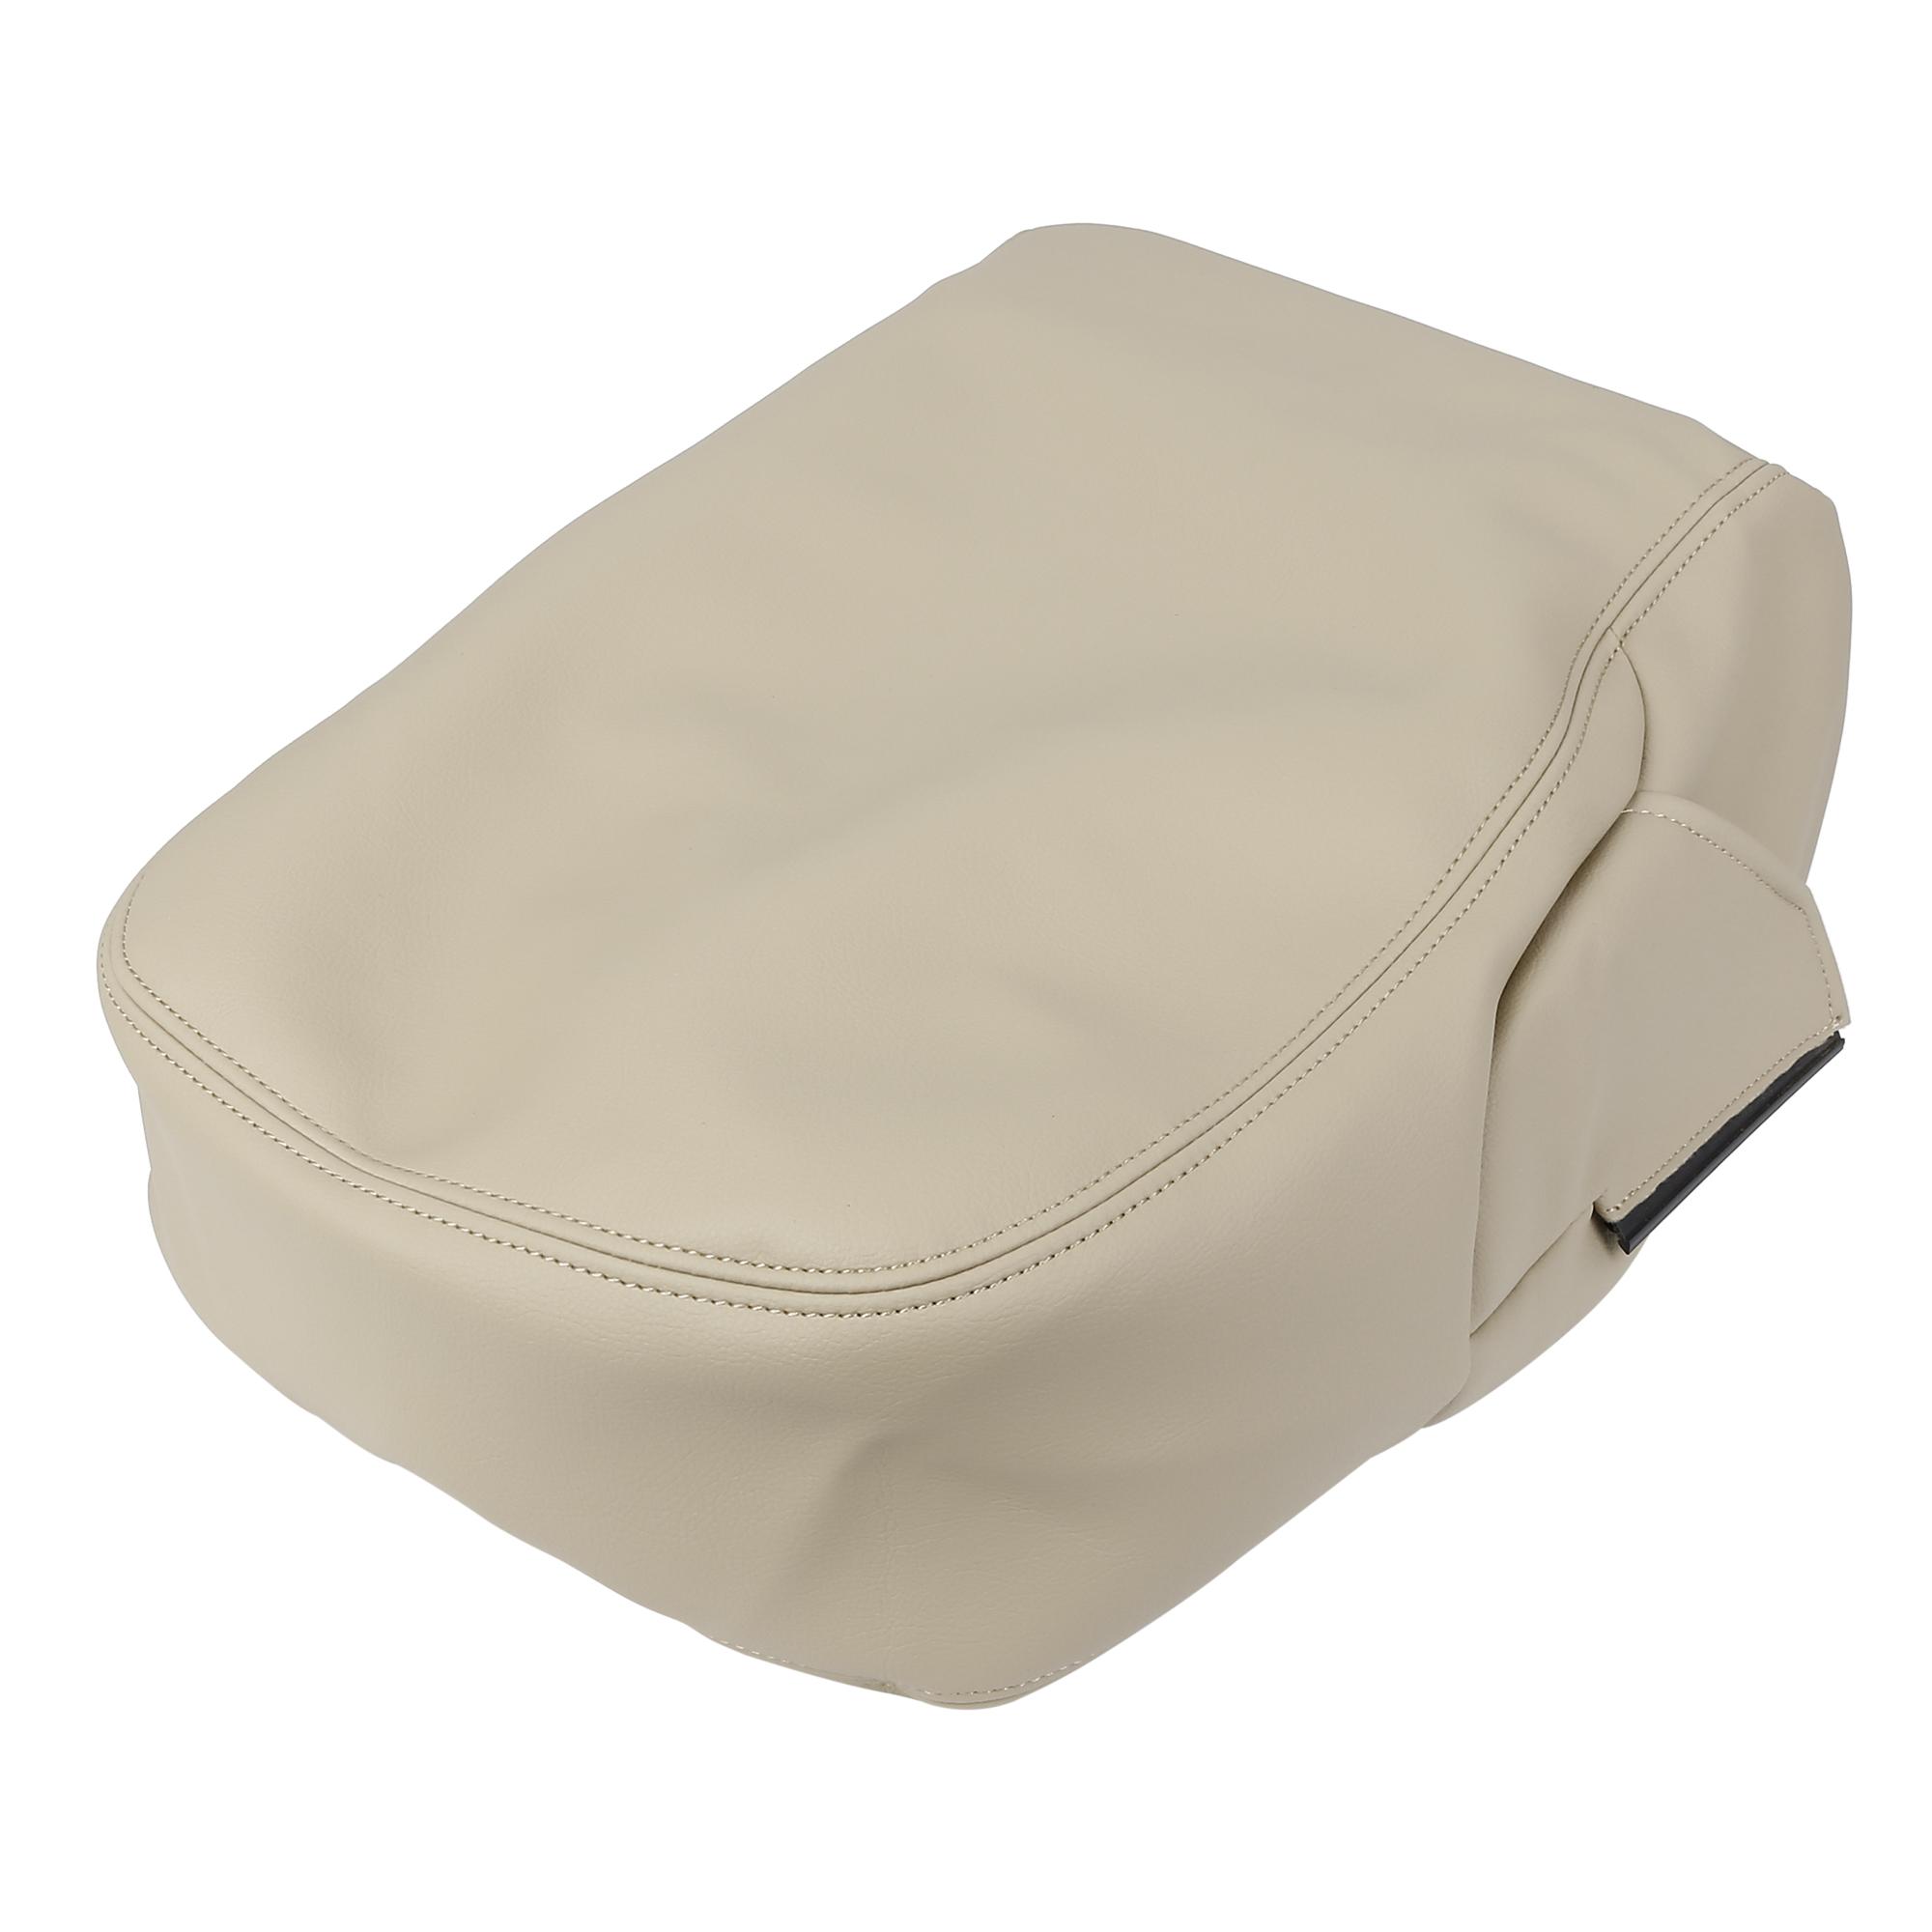 Car Center Console Lid Armrest Pad Cover Beige for Chevrolet Silverado 2007-2014